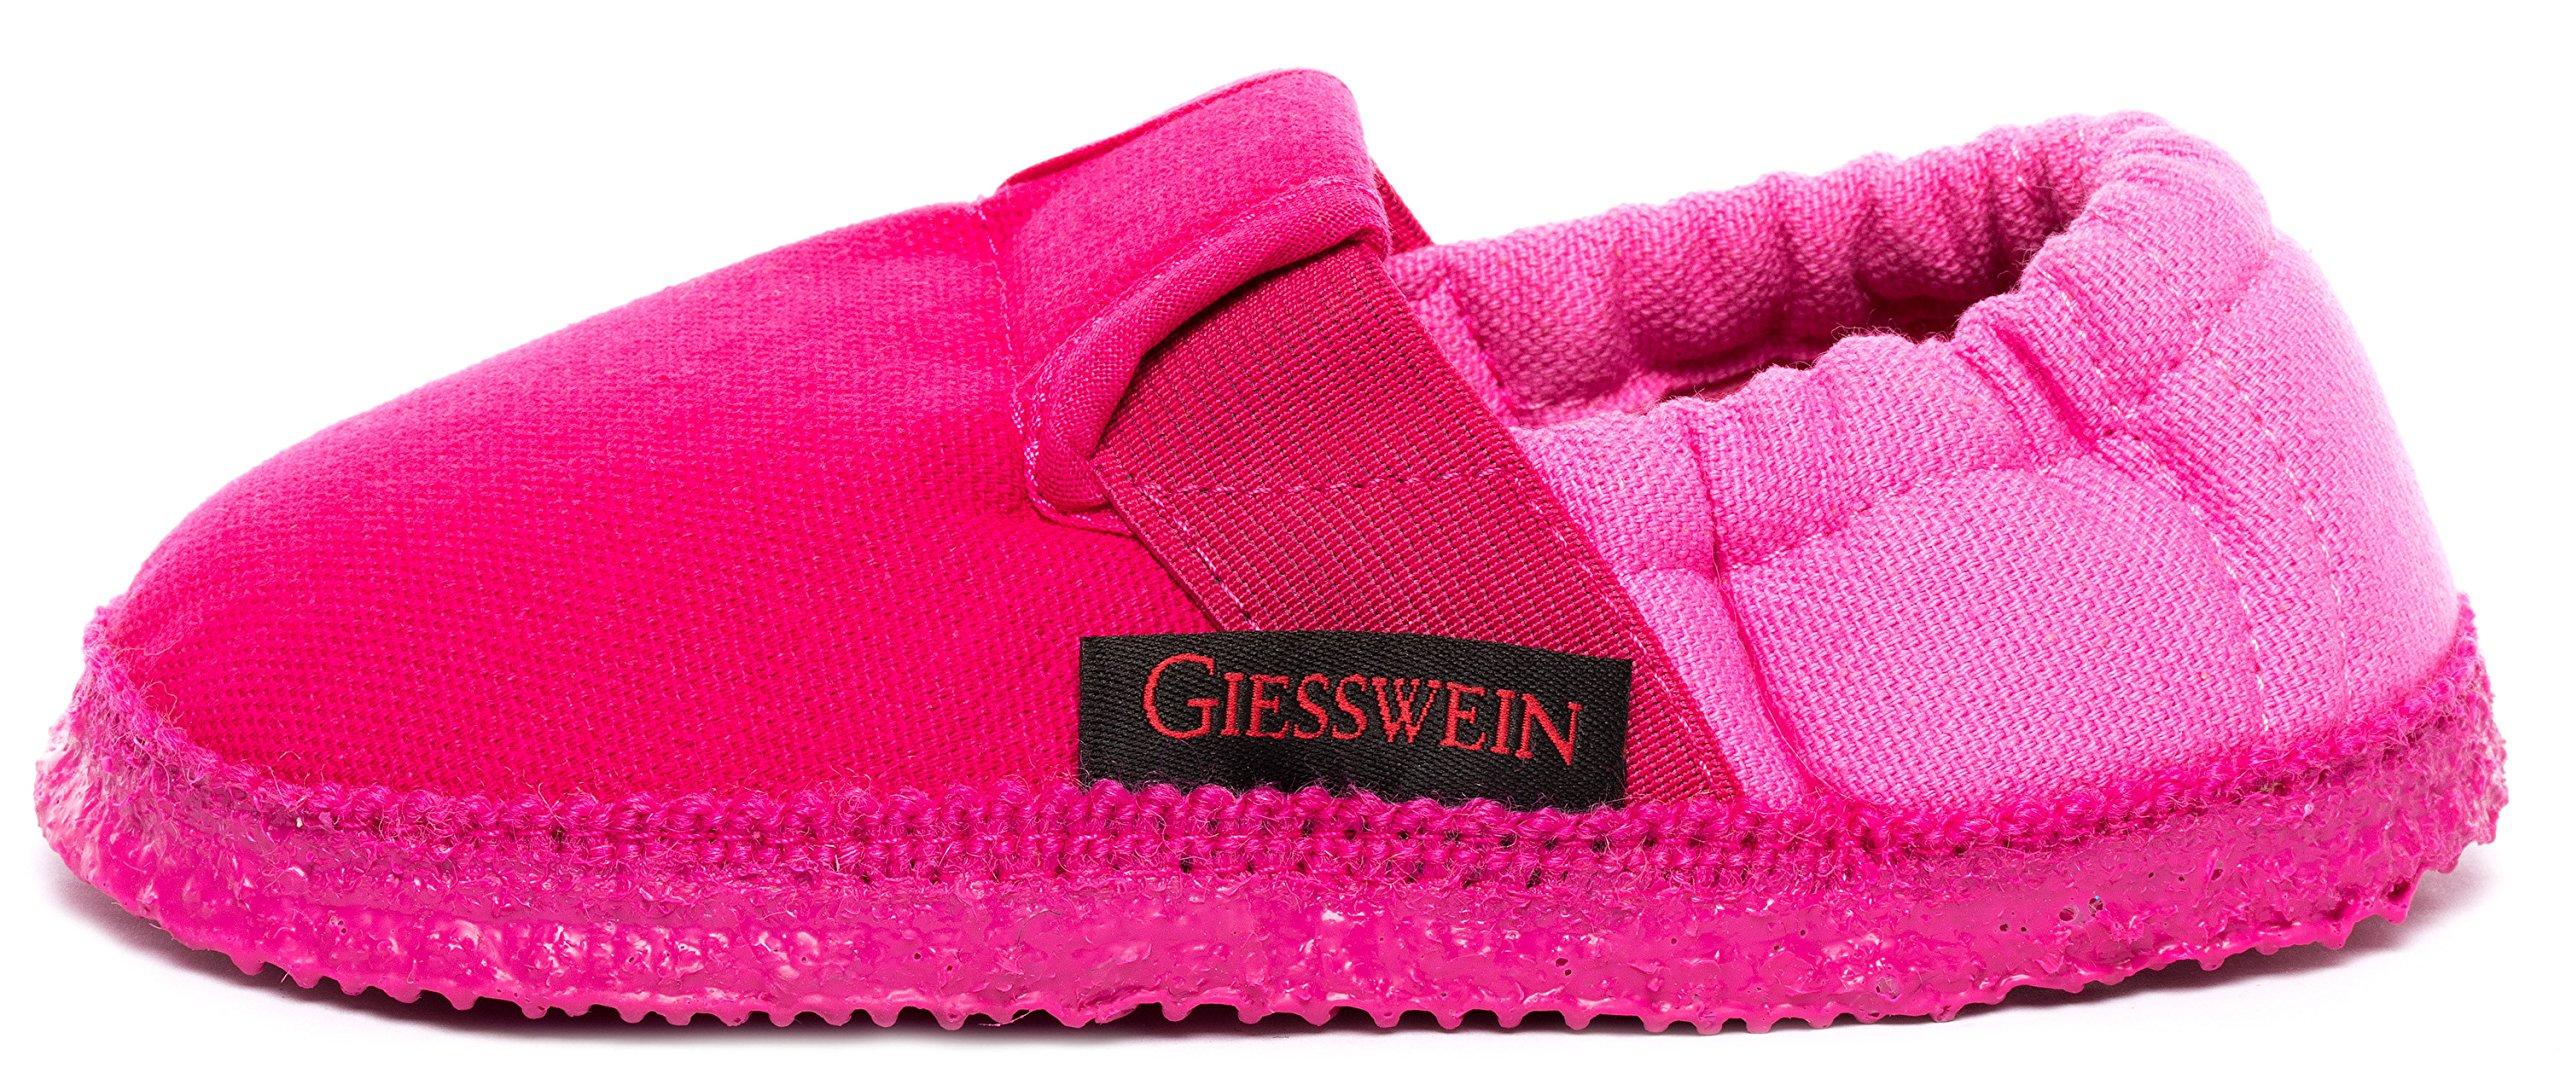 Giesswein Slippers Aichach by Giesswein (Image #1)